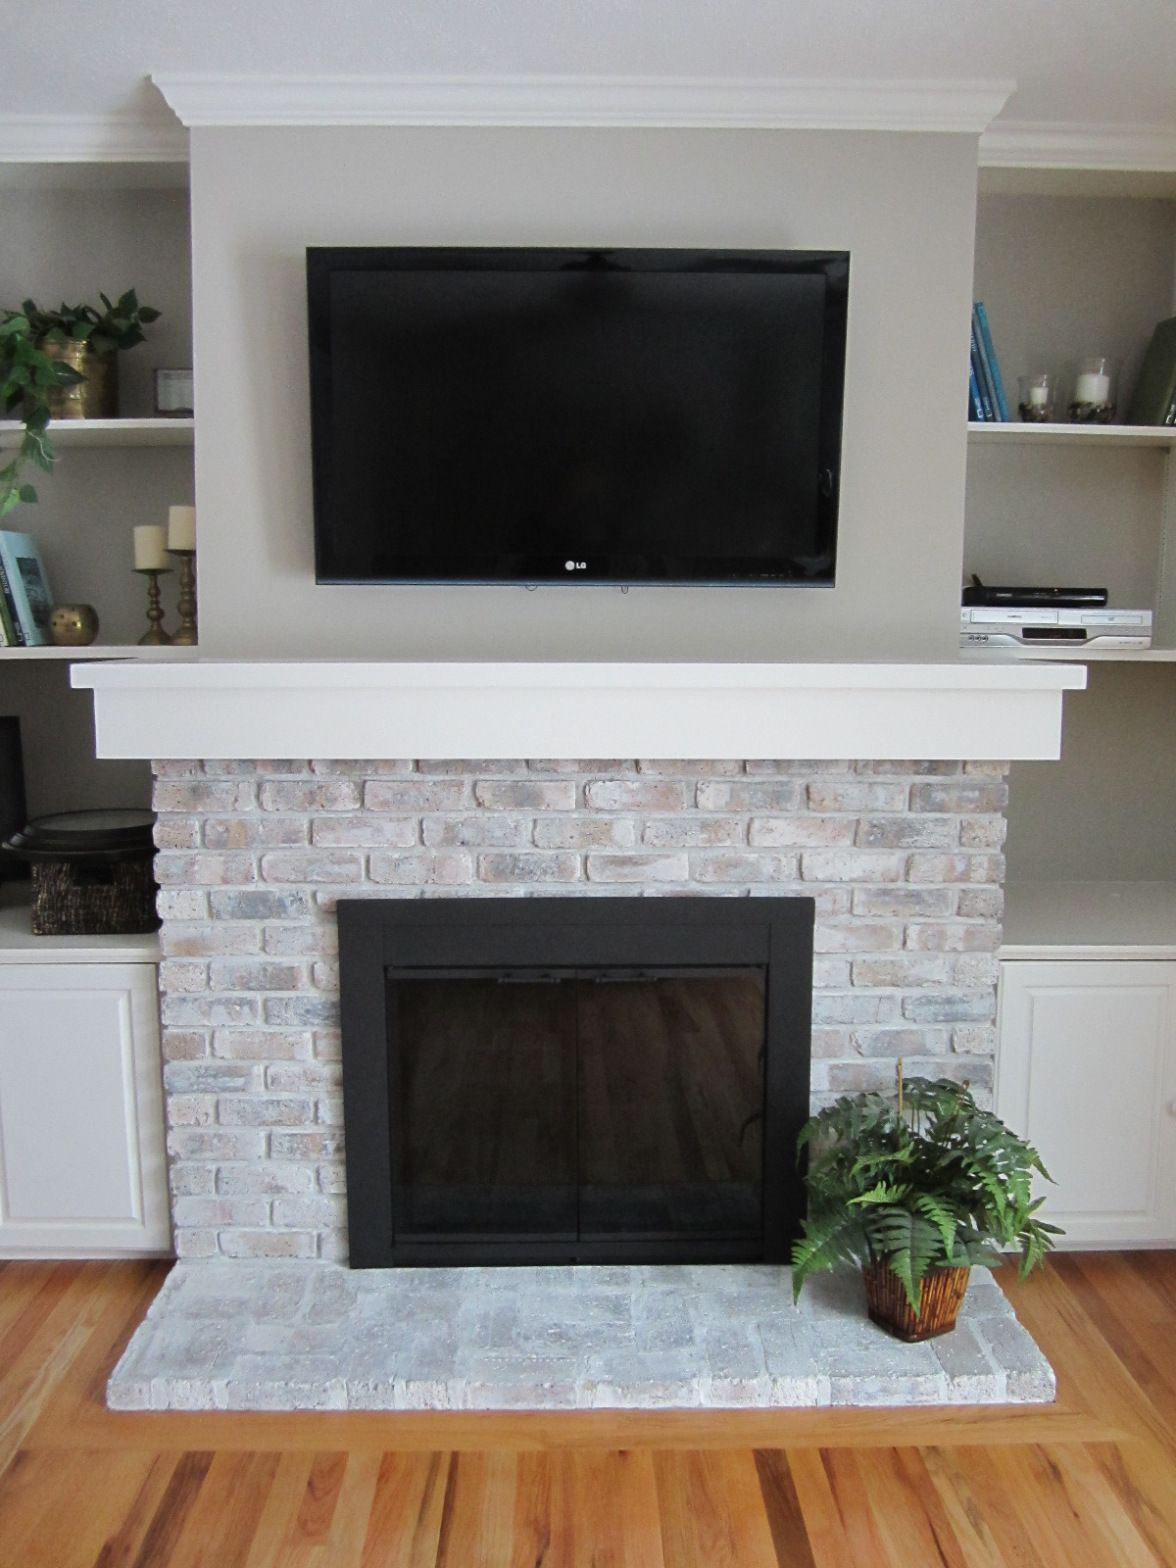 How to Whitewash a Fireplace Brick fireplace Bricks and Fireplace